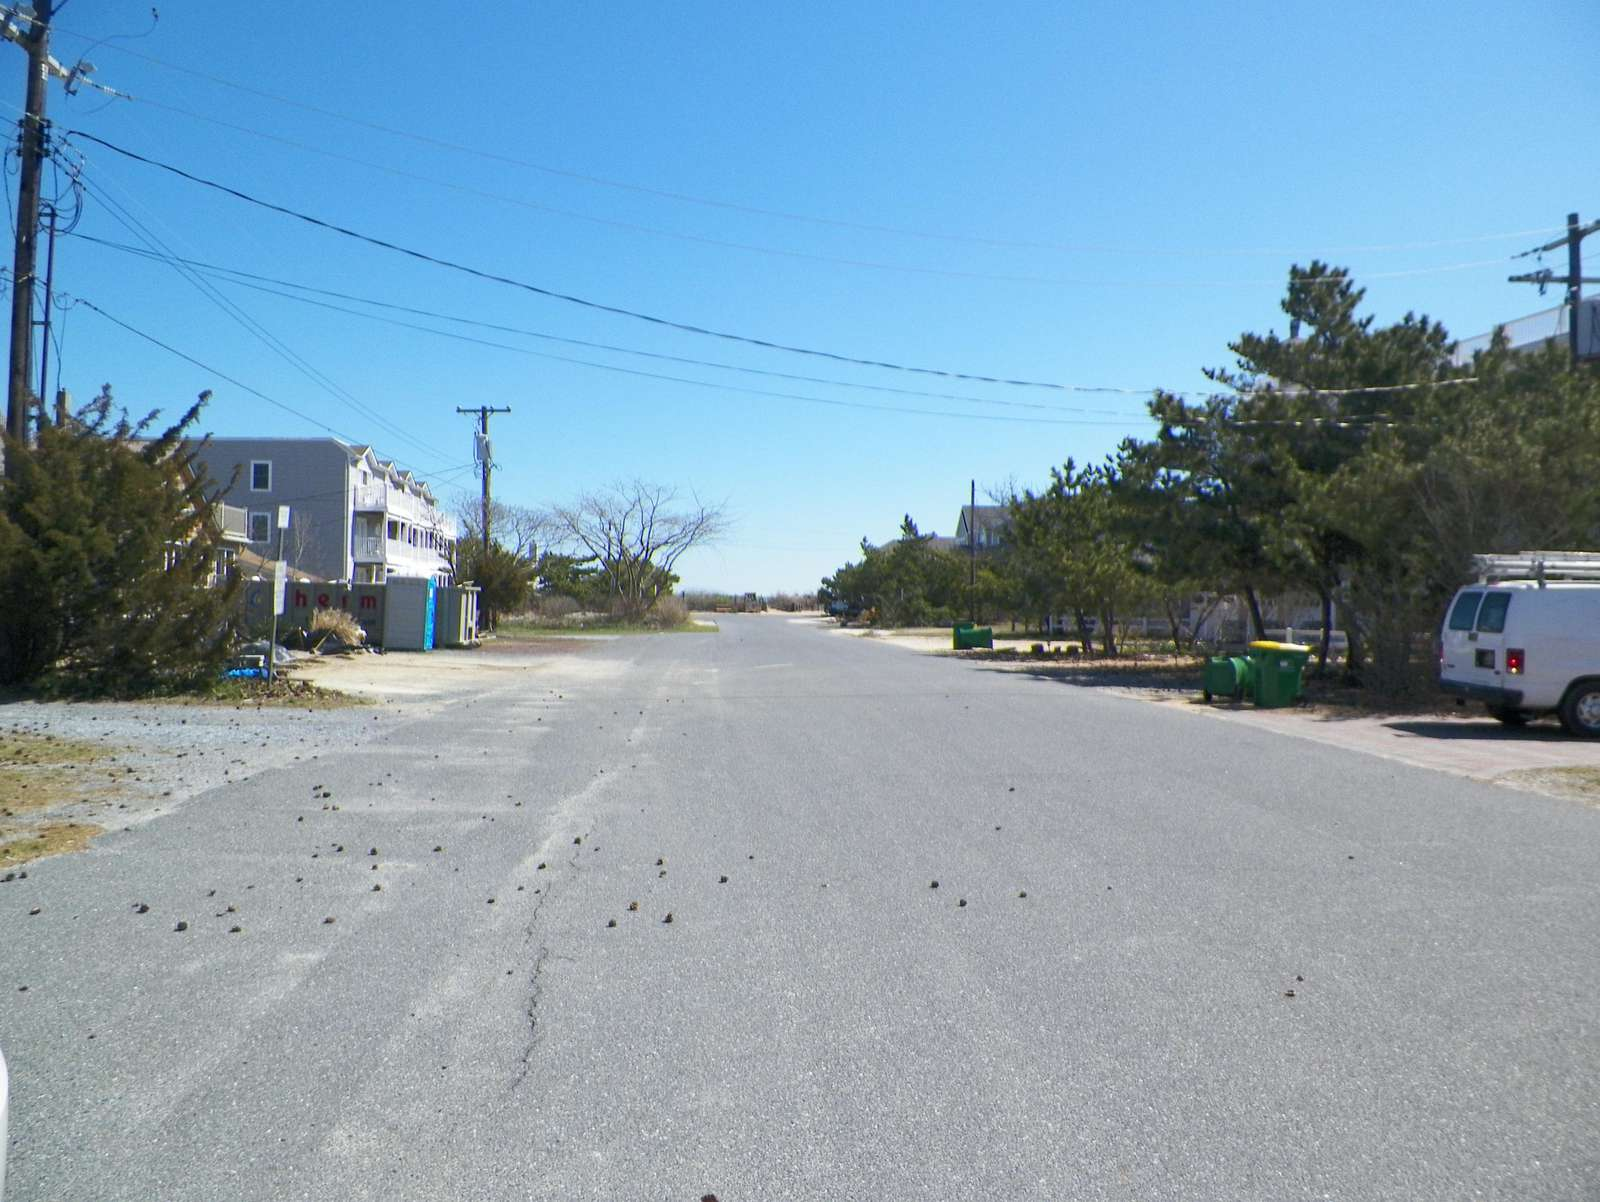 Walking distance to beach